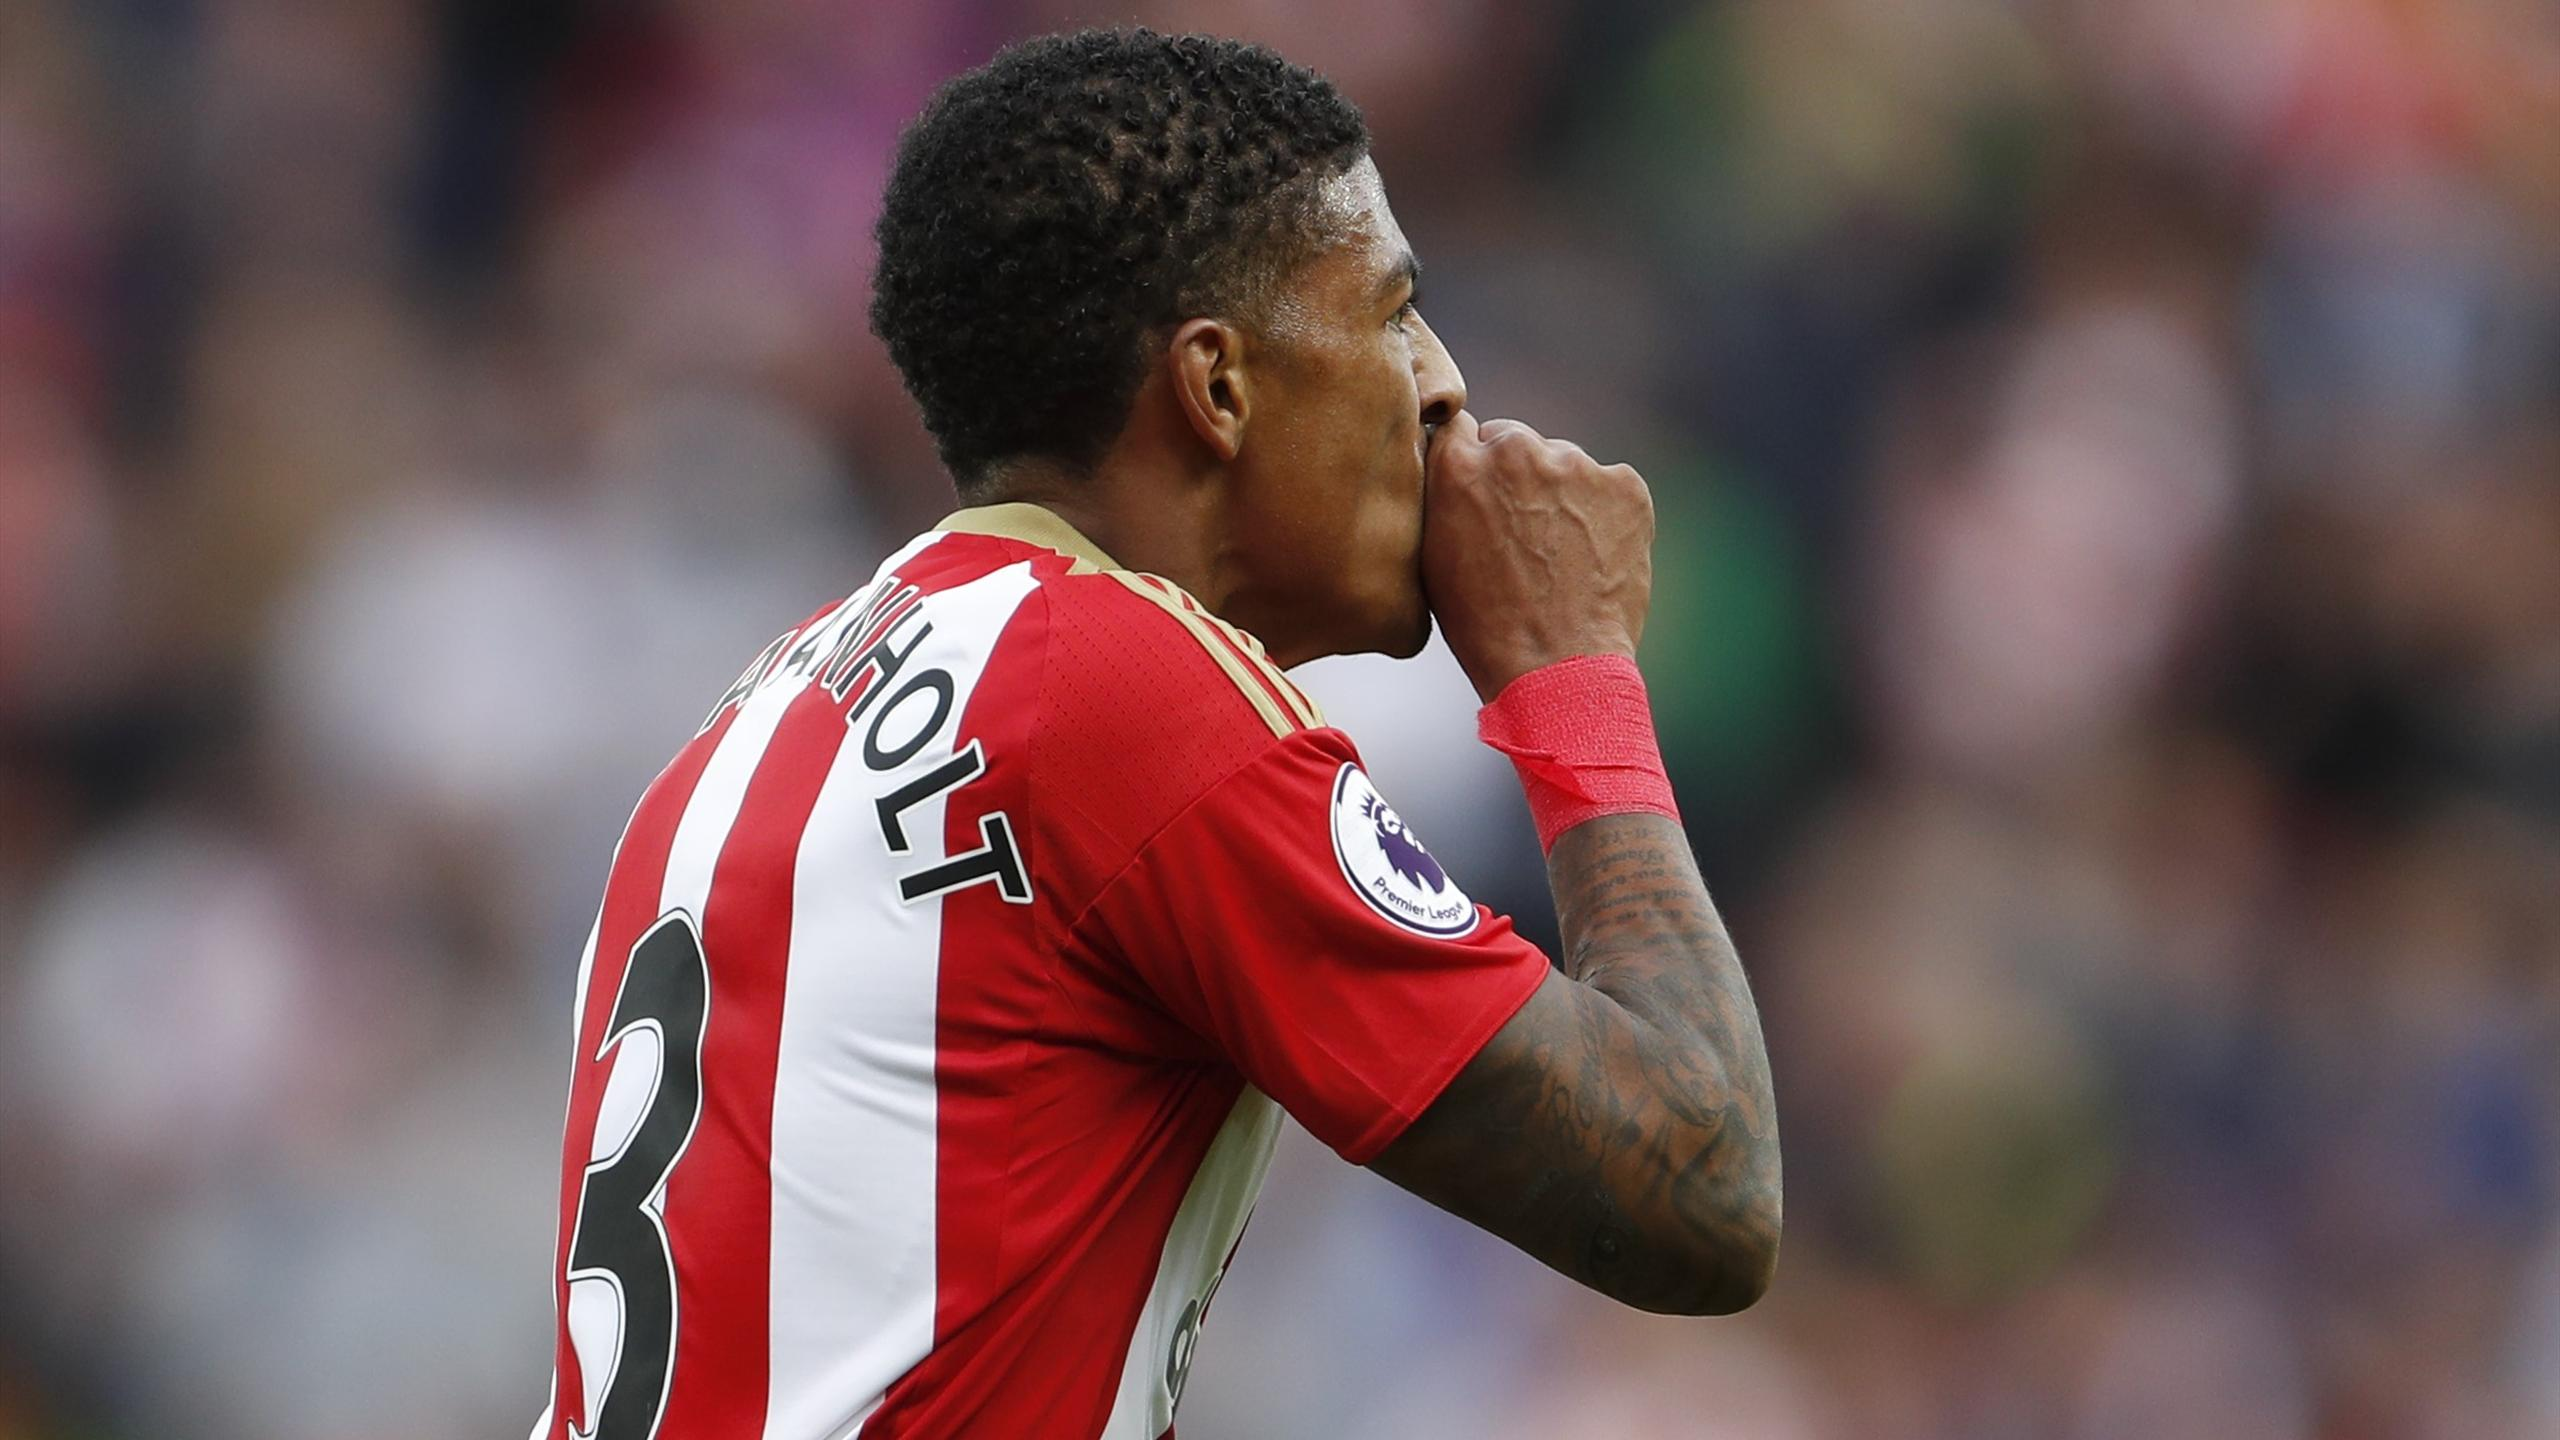 Sunderland's Patrick van Aanholt celebrates scoring their first goal